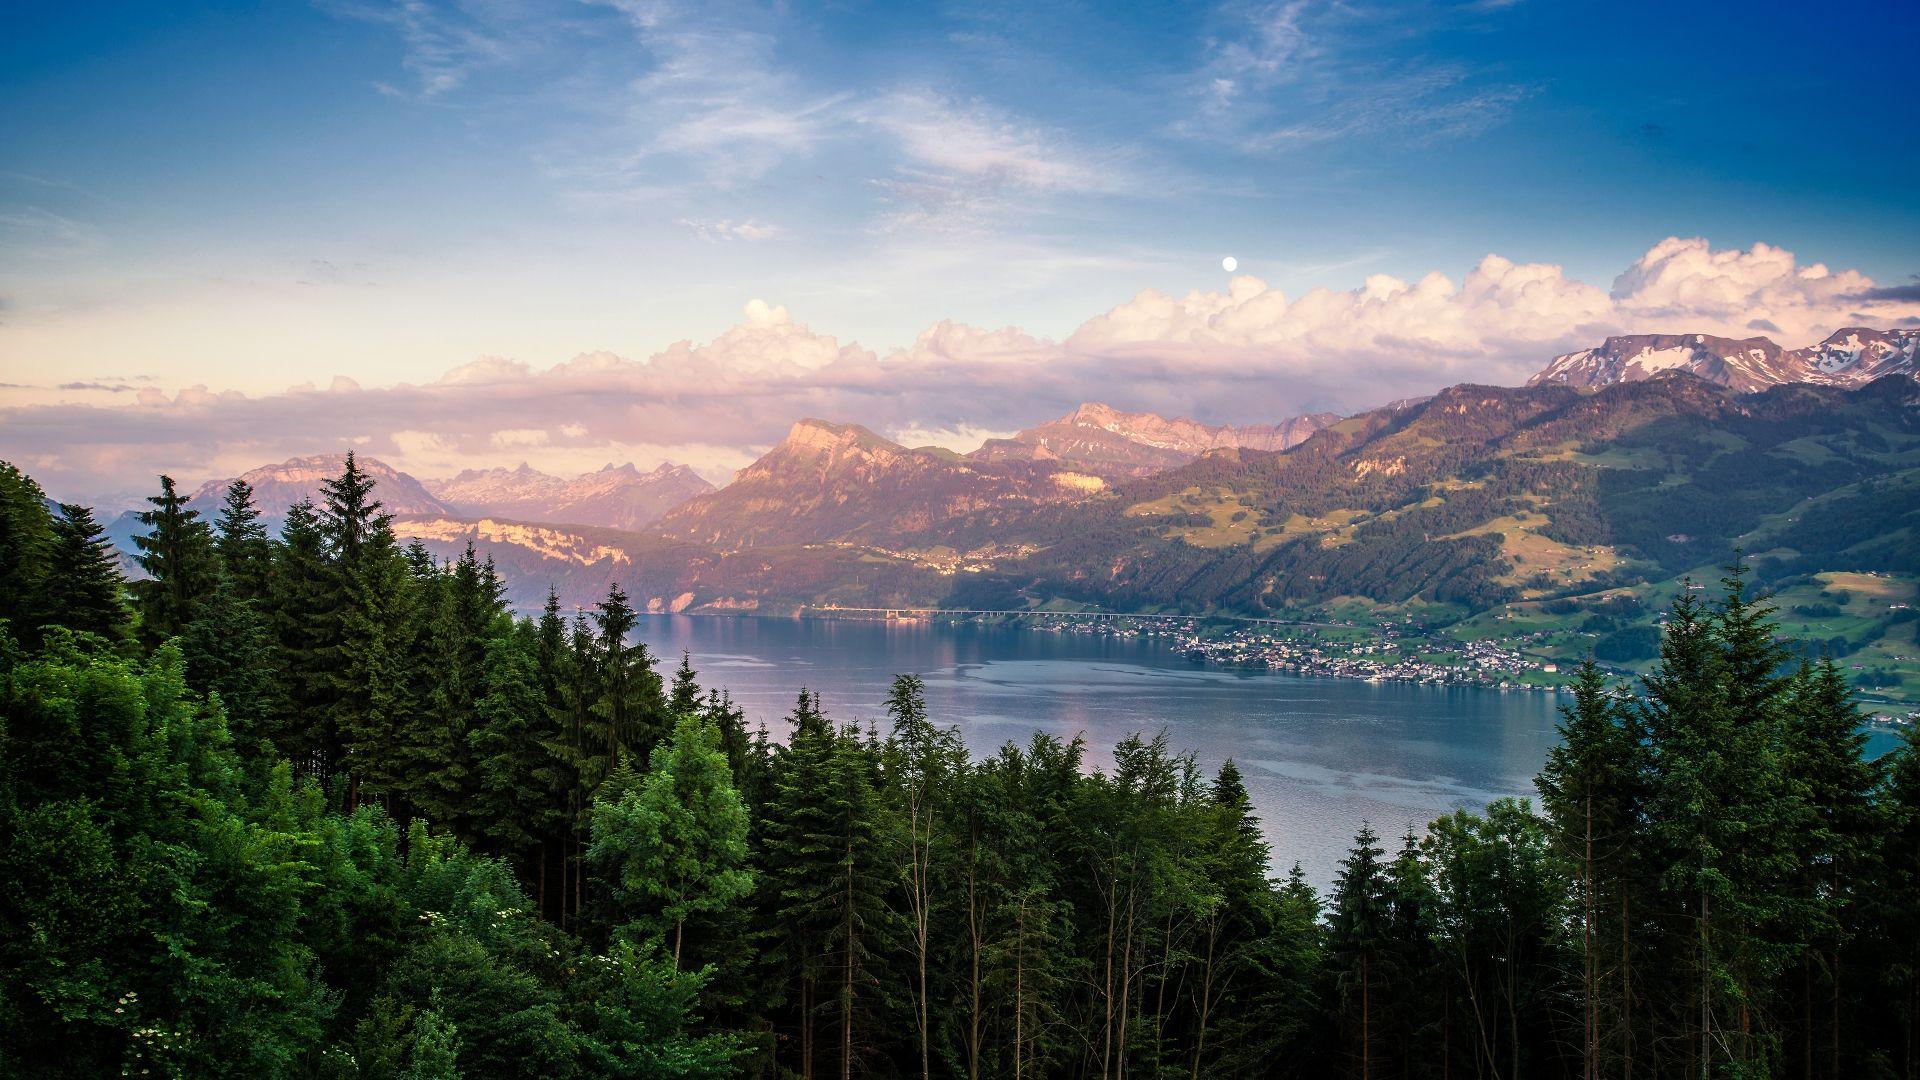 lake zurich landscape for 1920 x 1080 hdtv 1080p resolution a· landscape wallpapernature